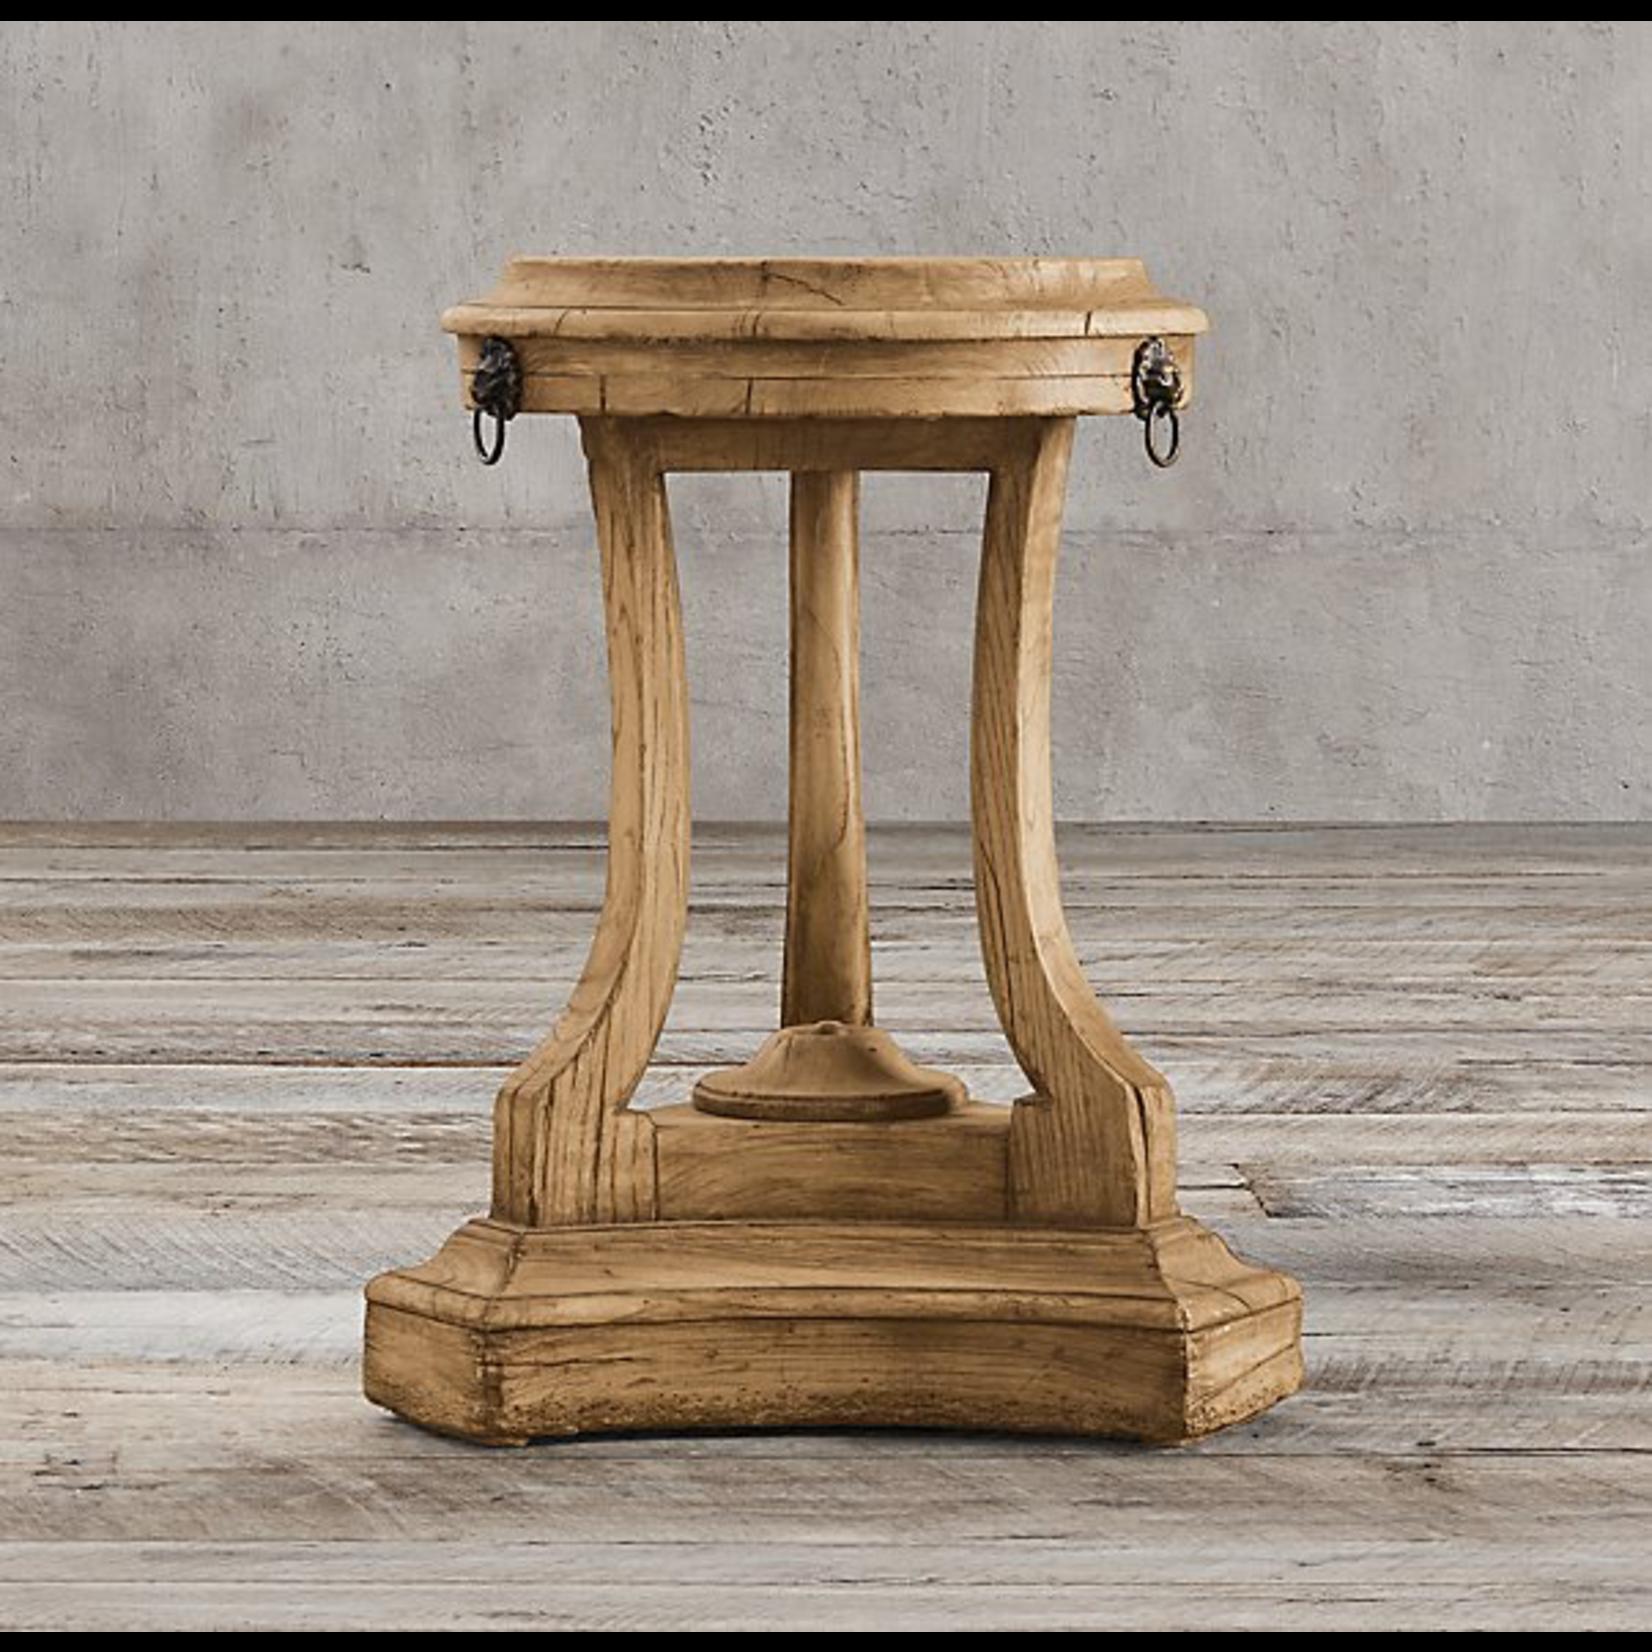 VAN THIEL LION SIDE TABLE SMALL